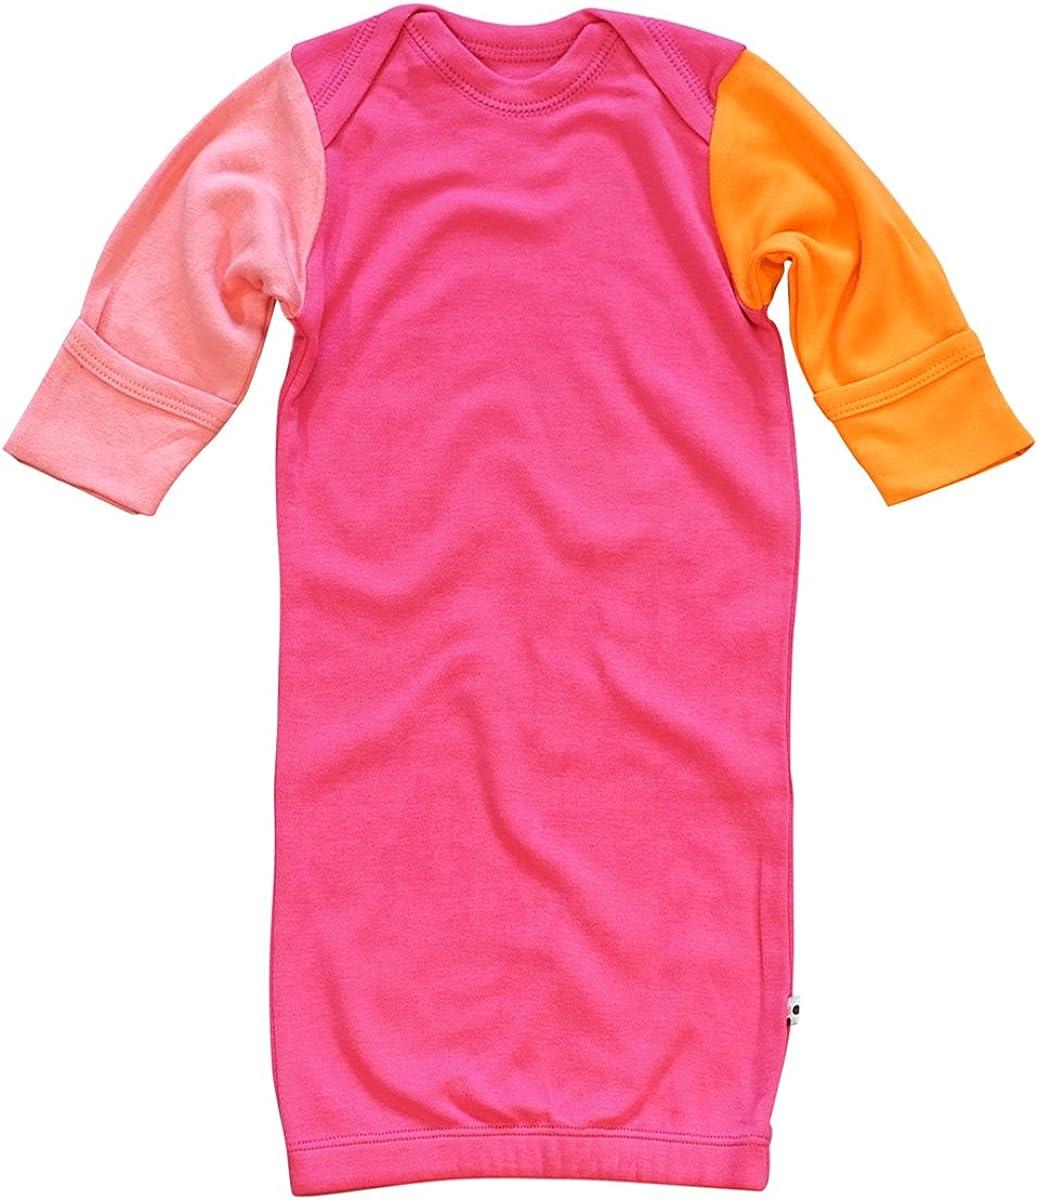 Babysoy Long Sleeve Mix Color Organic Gown/Bundler